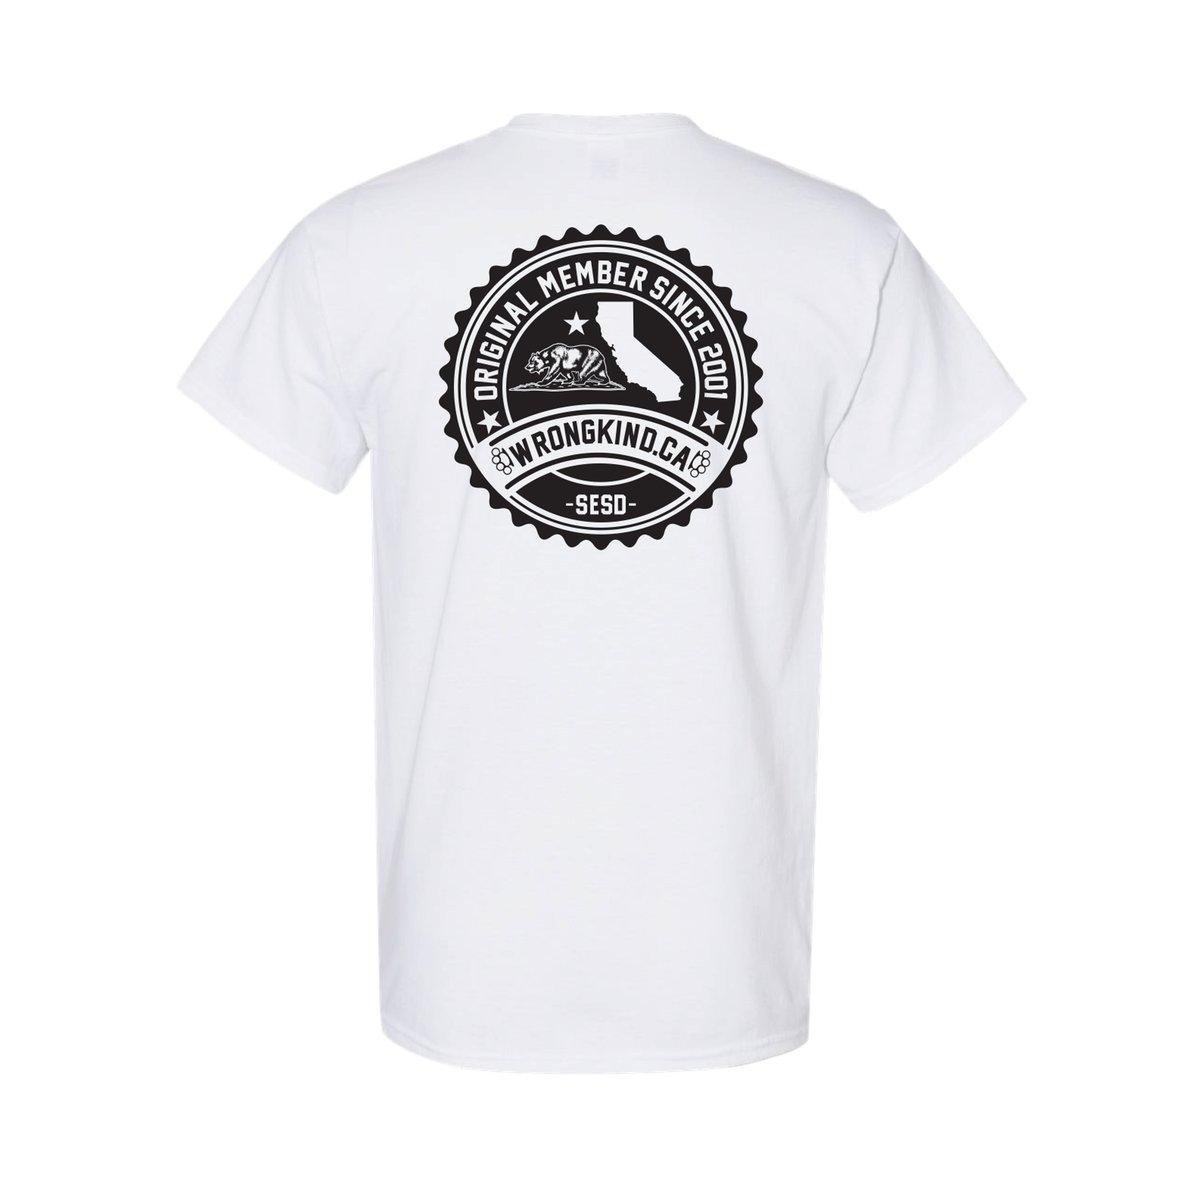 Image of Wrongkind Stamp T-Shirt (White w/ Black)